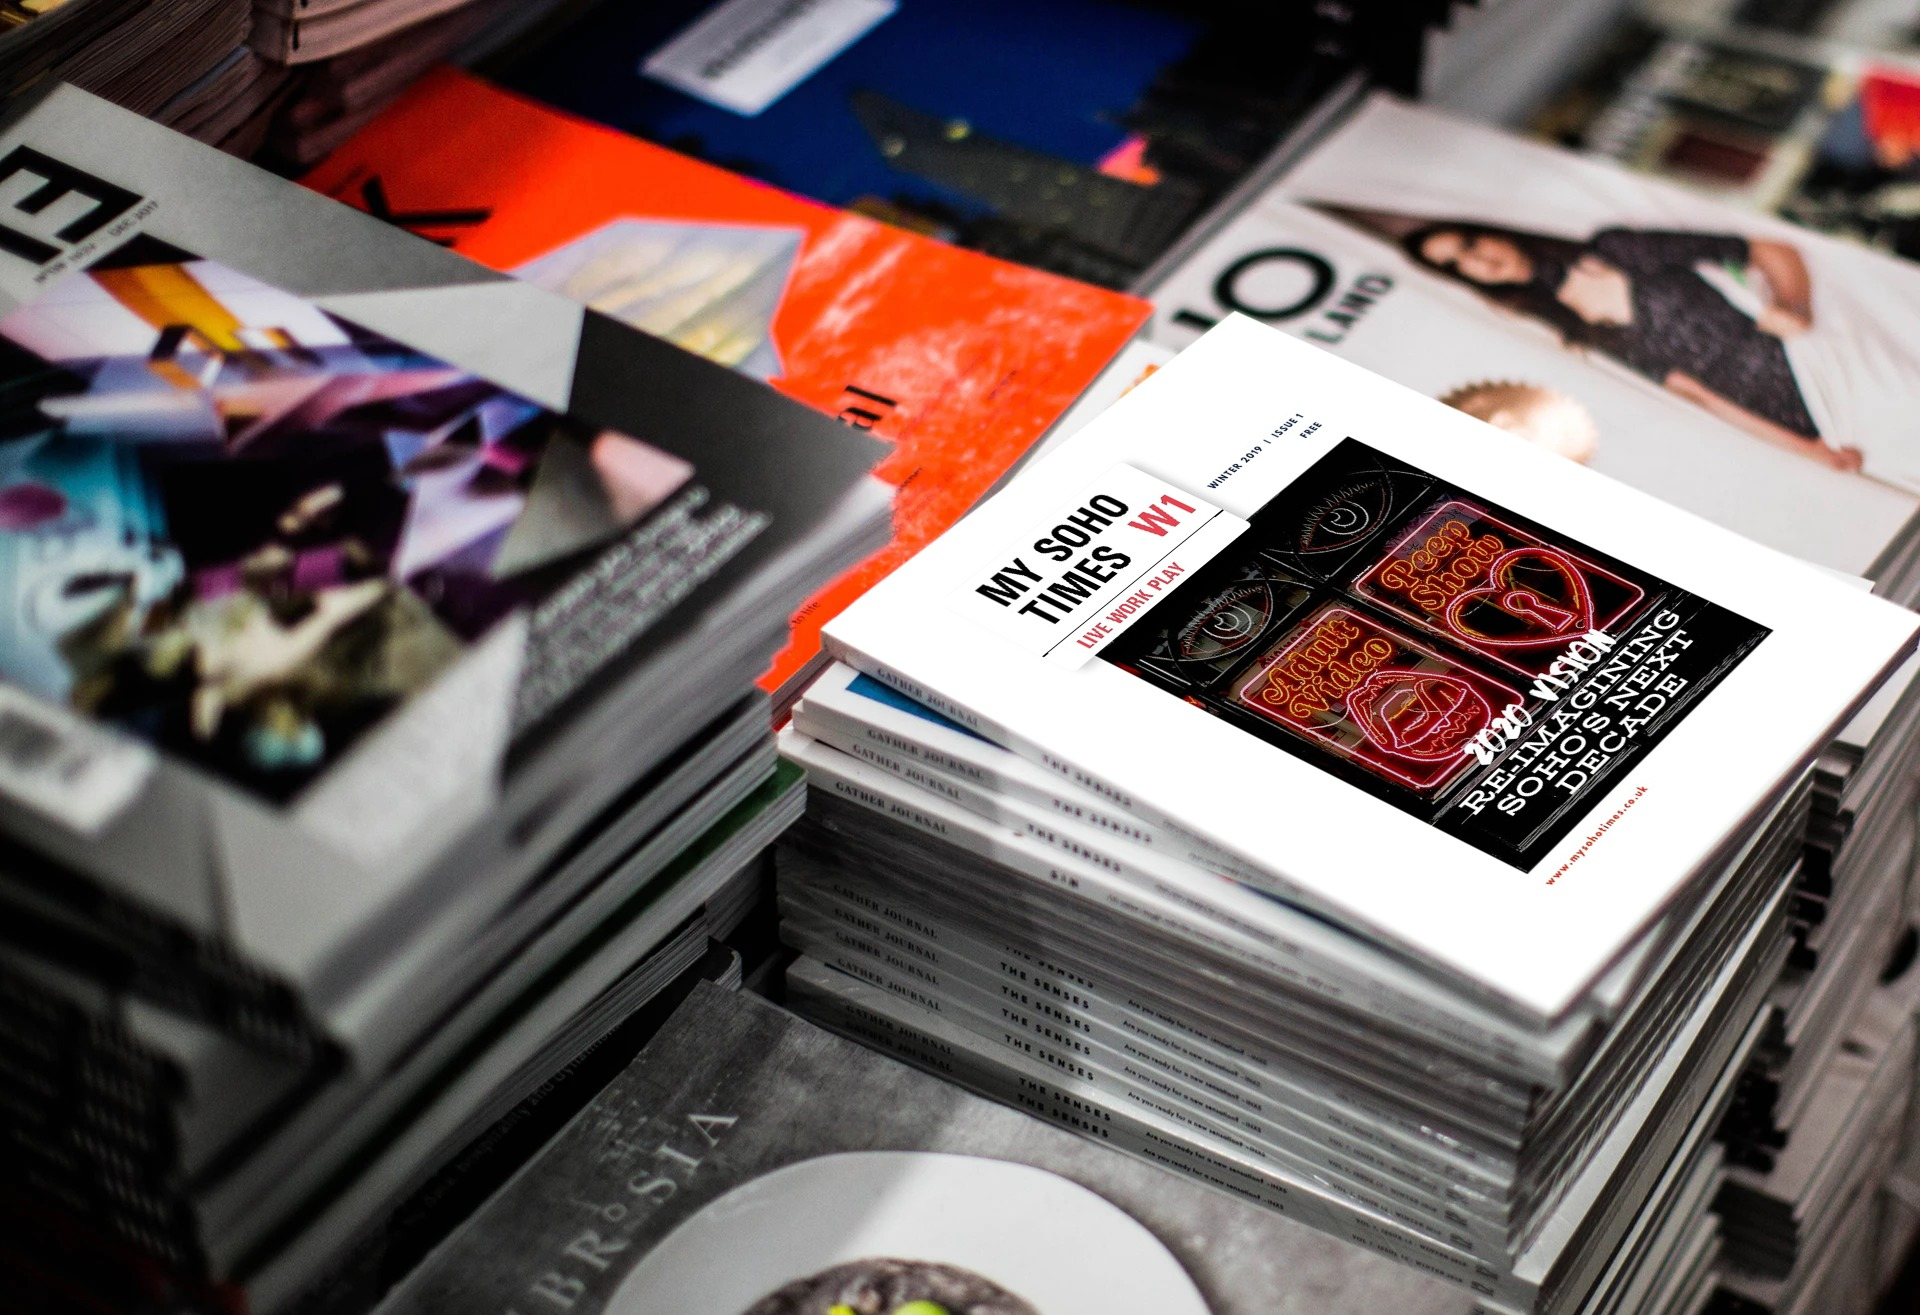 My Soho Times magazine subscripton.jpg